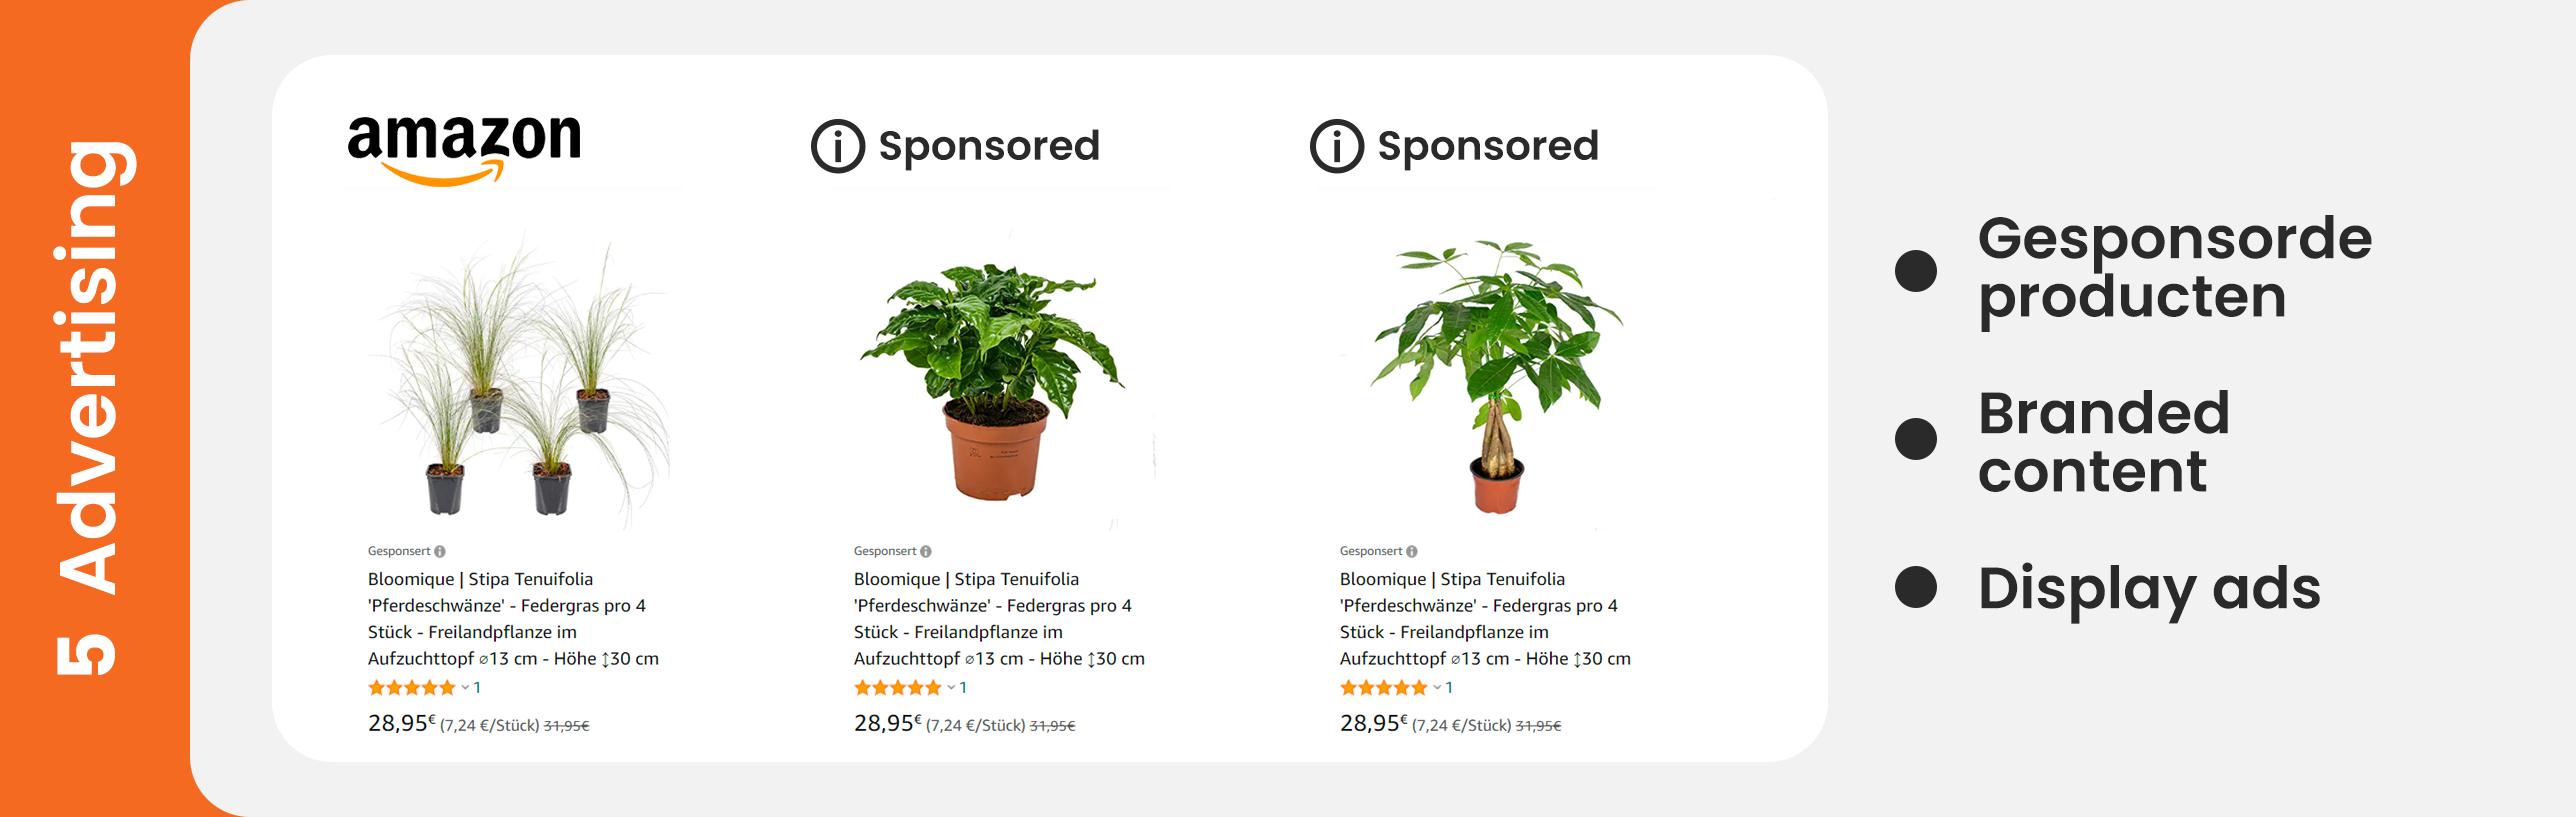 Amazon Advertising, Amazon sponsored products